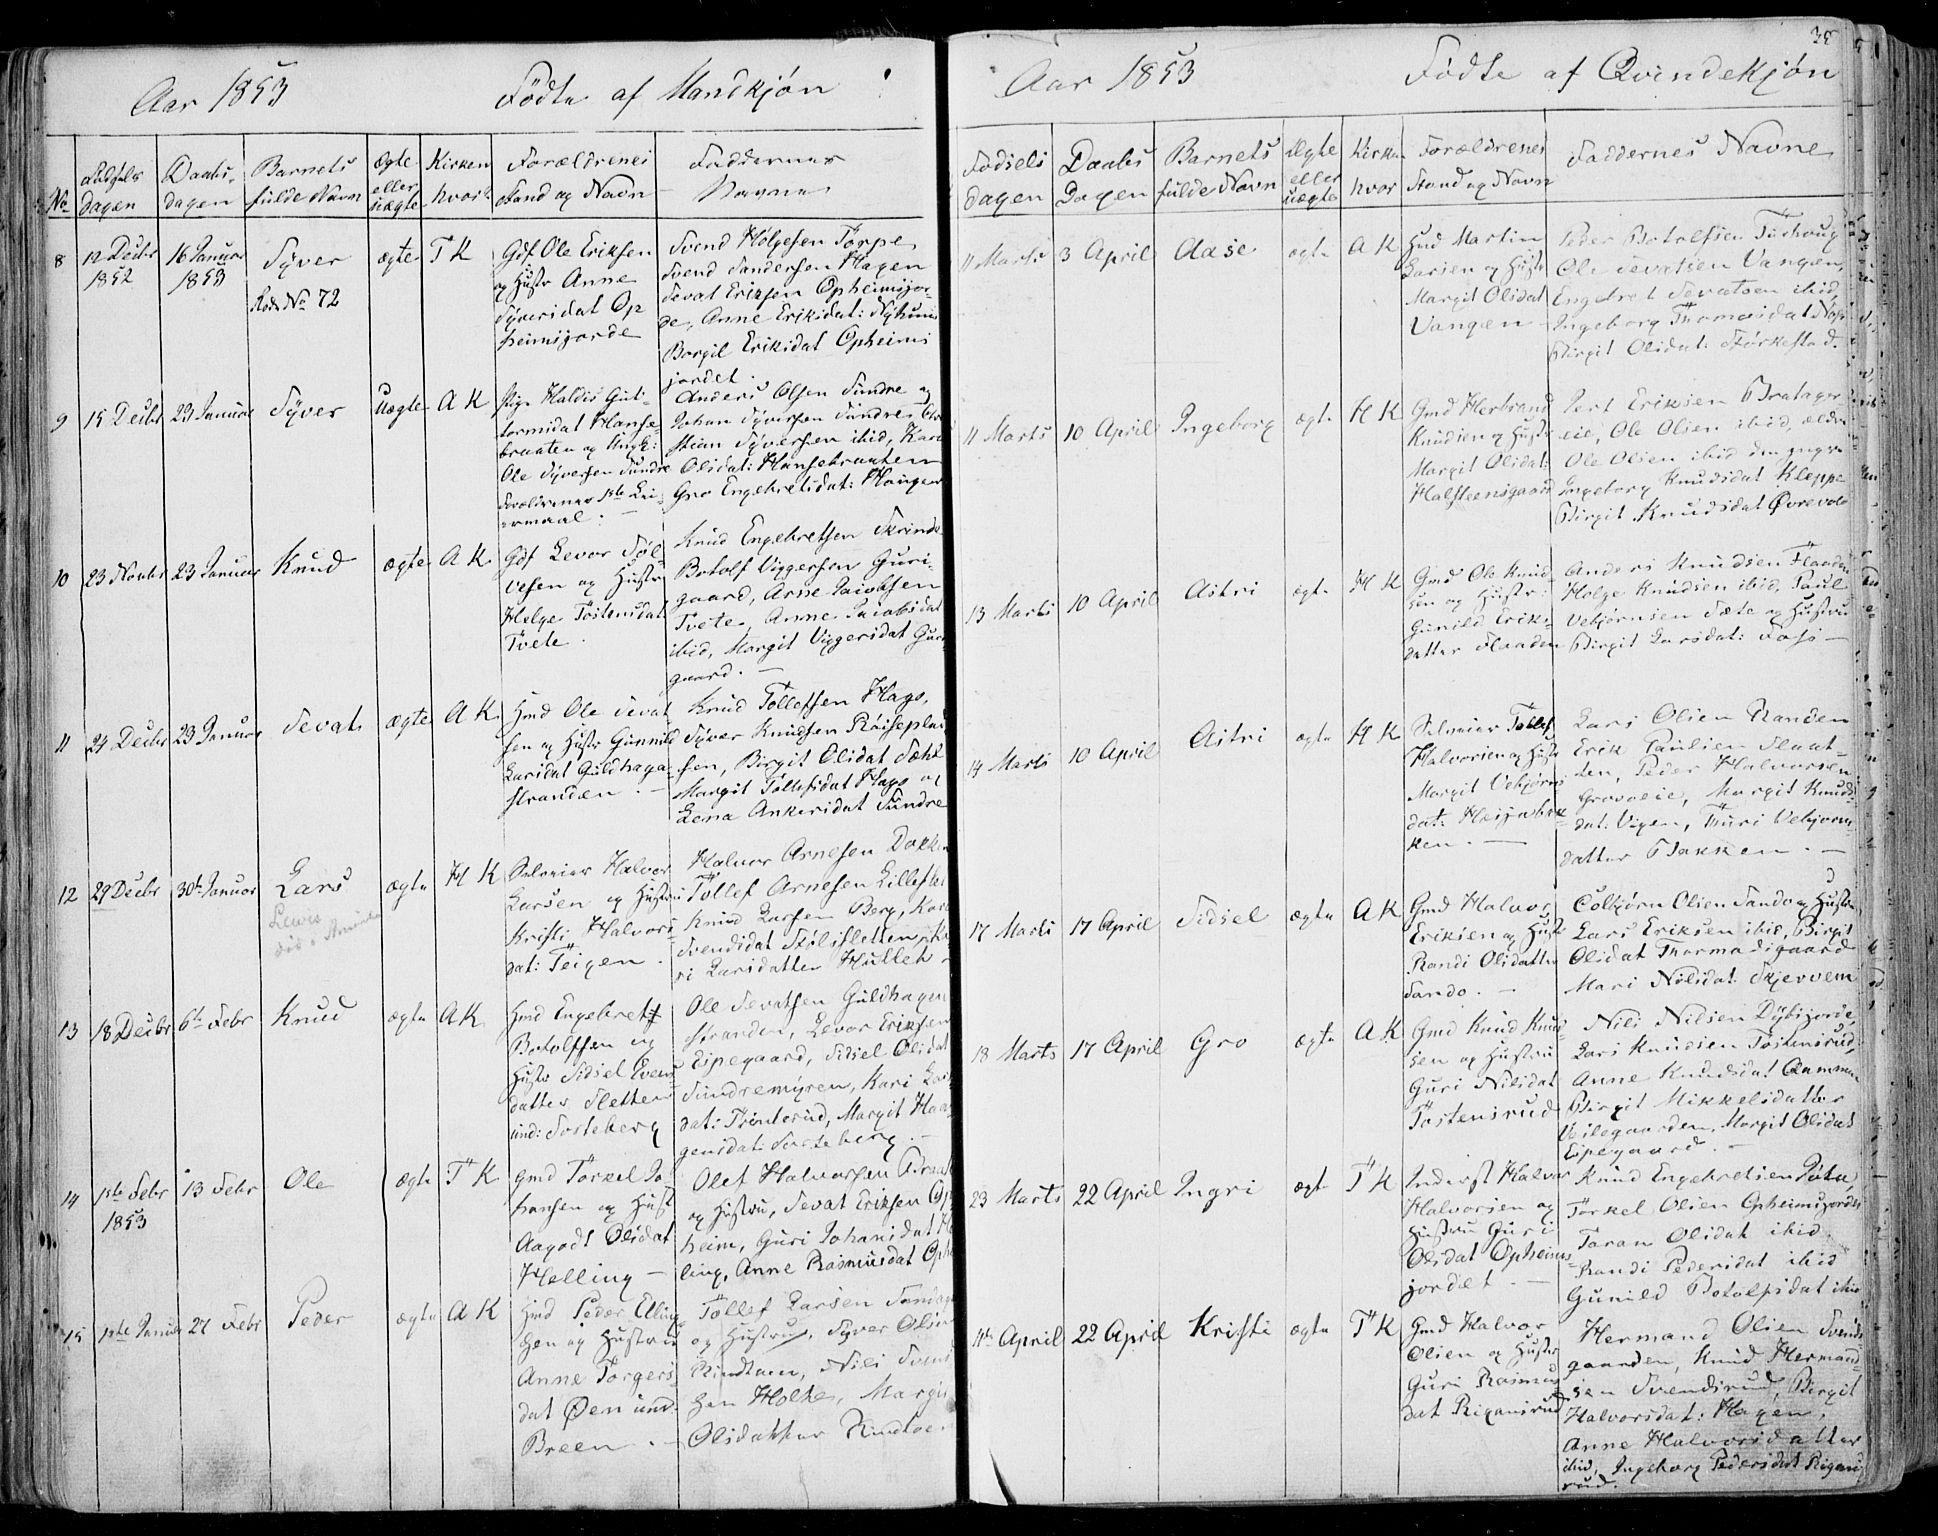 SAKO, Ål kirkebøker, F/Fa/L0006: Ministerialbok nr. I 6, 1849-1864, s. 35